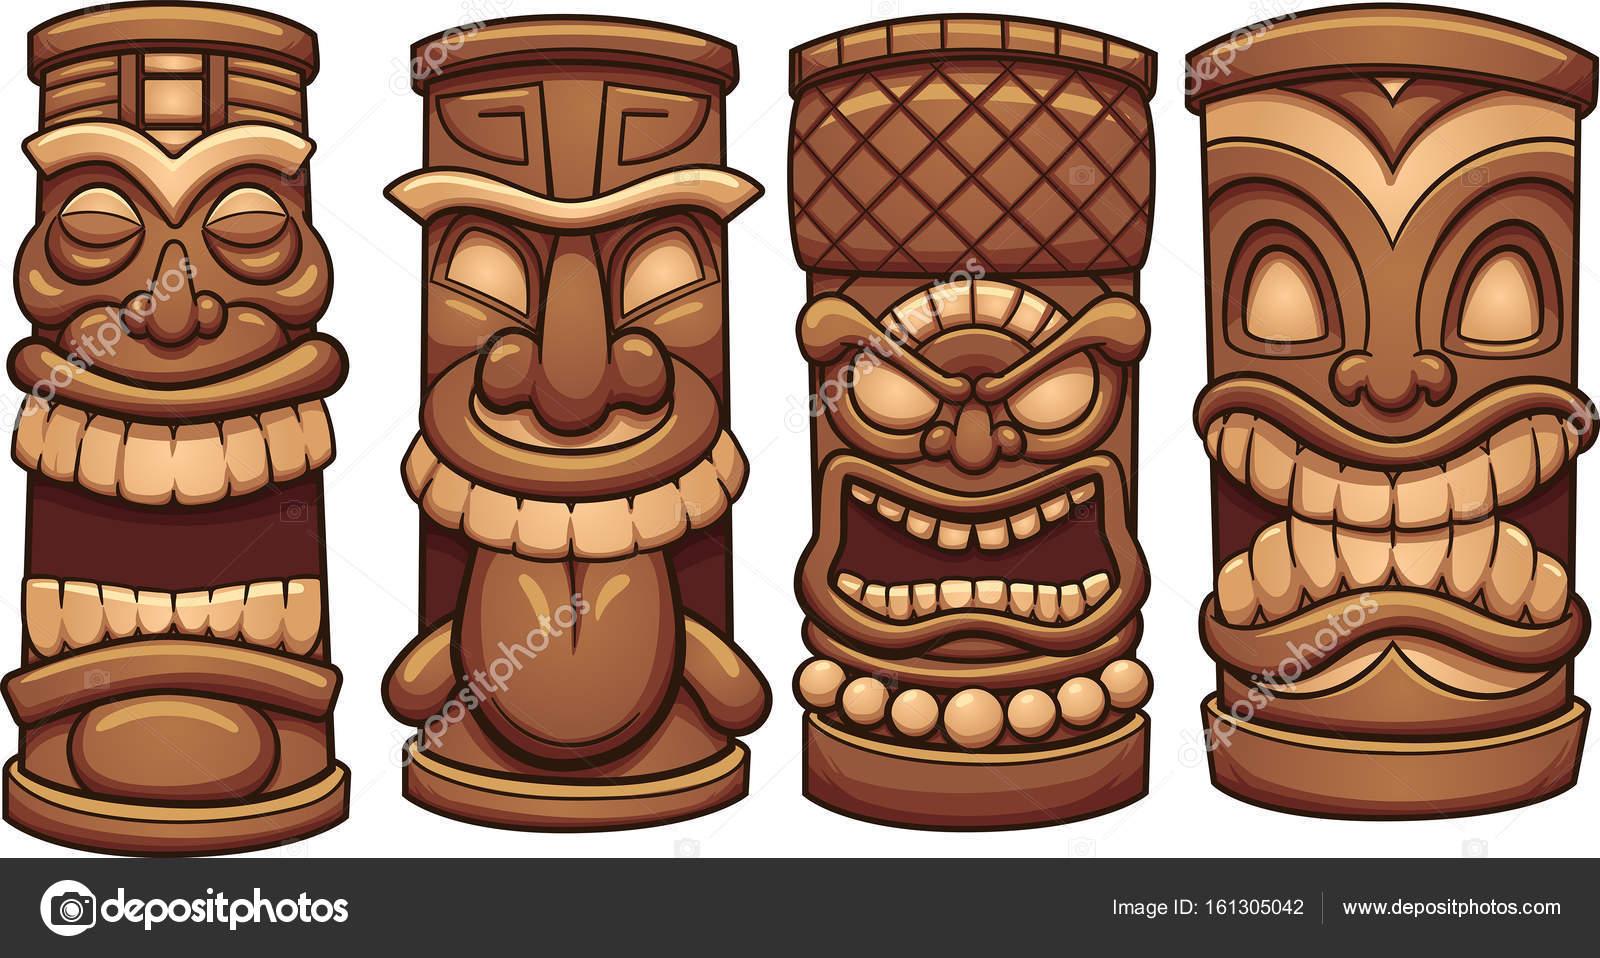 Cartoon tiki totems stock vector memoangeles 161305042 cartoon tiki totems stock vector stopboris Gallery